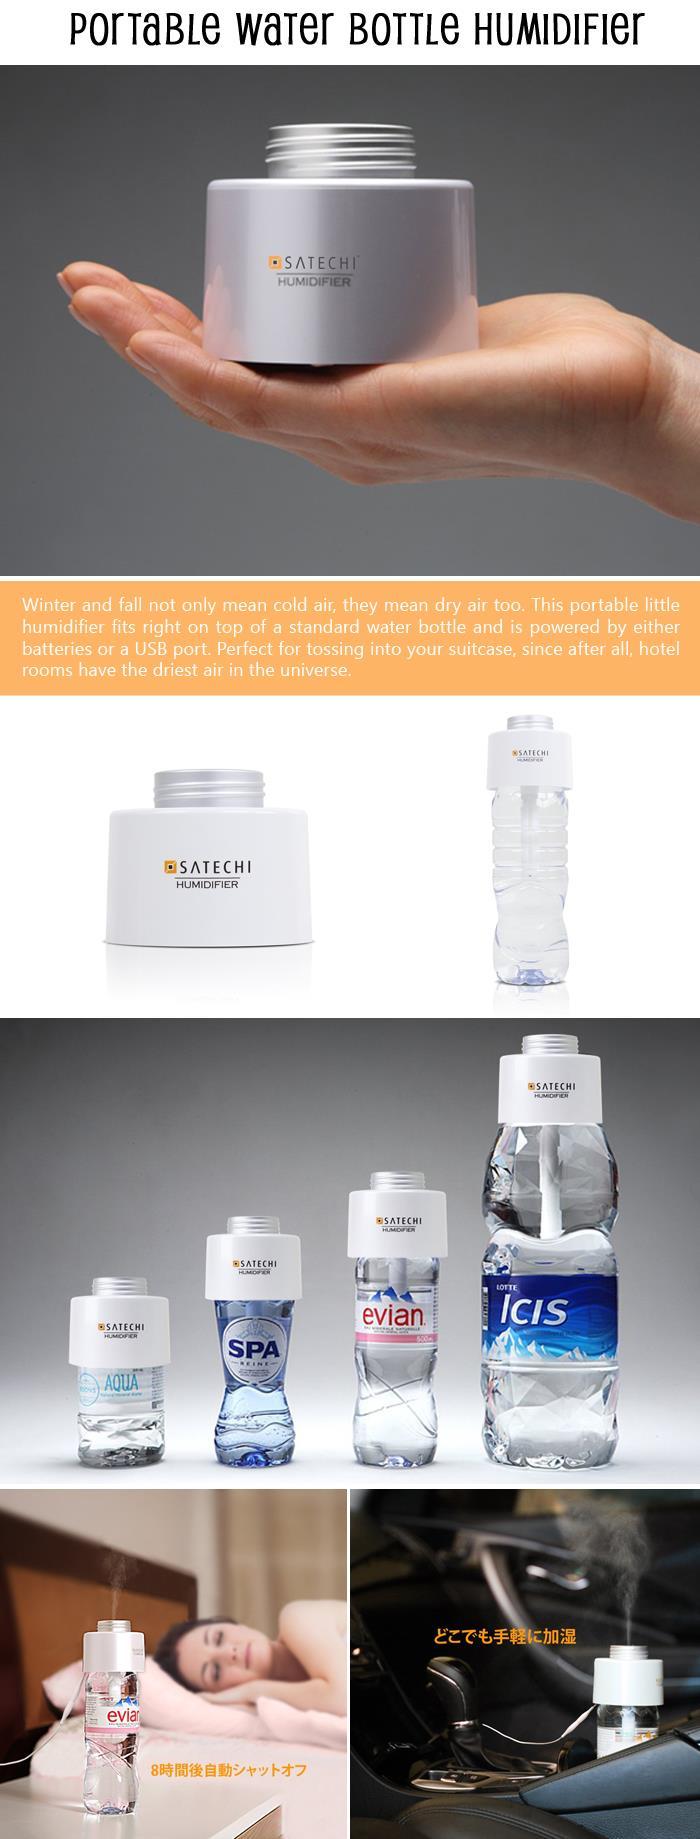 Portable-Water-Bottle-Humidifier